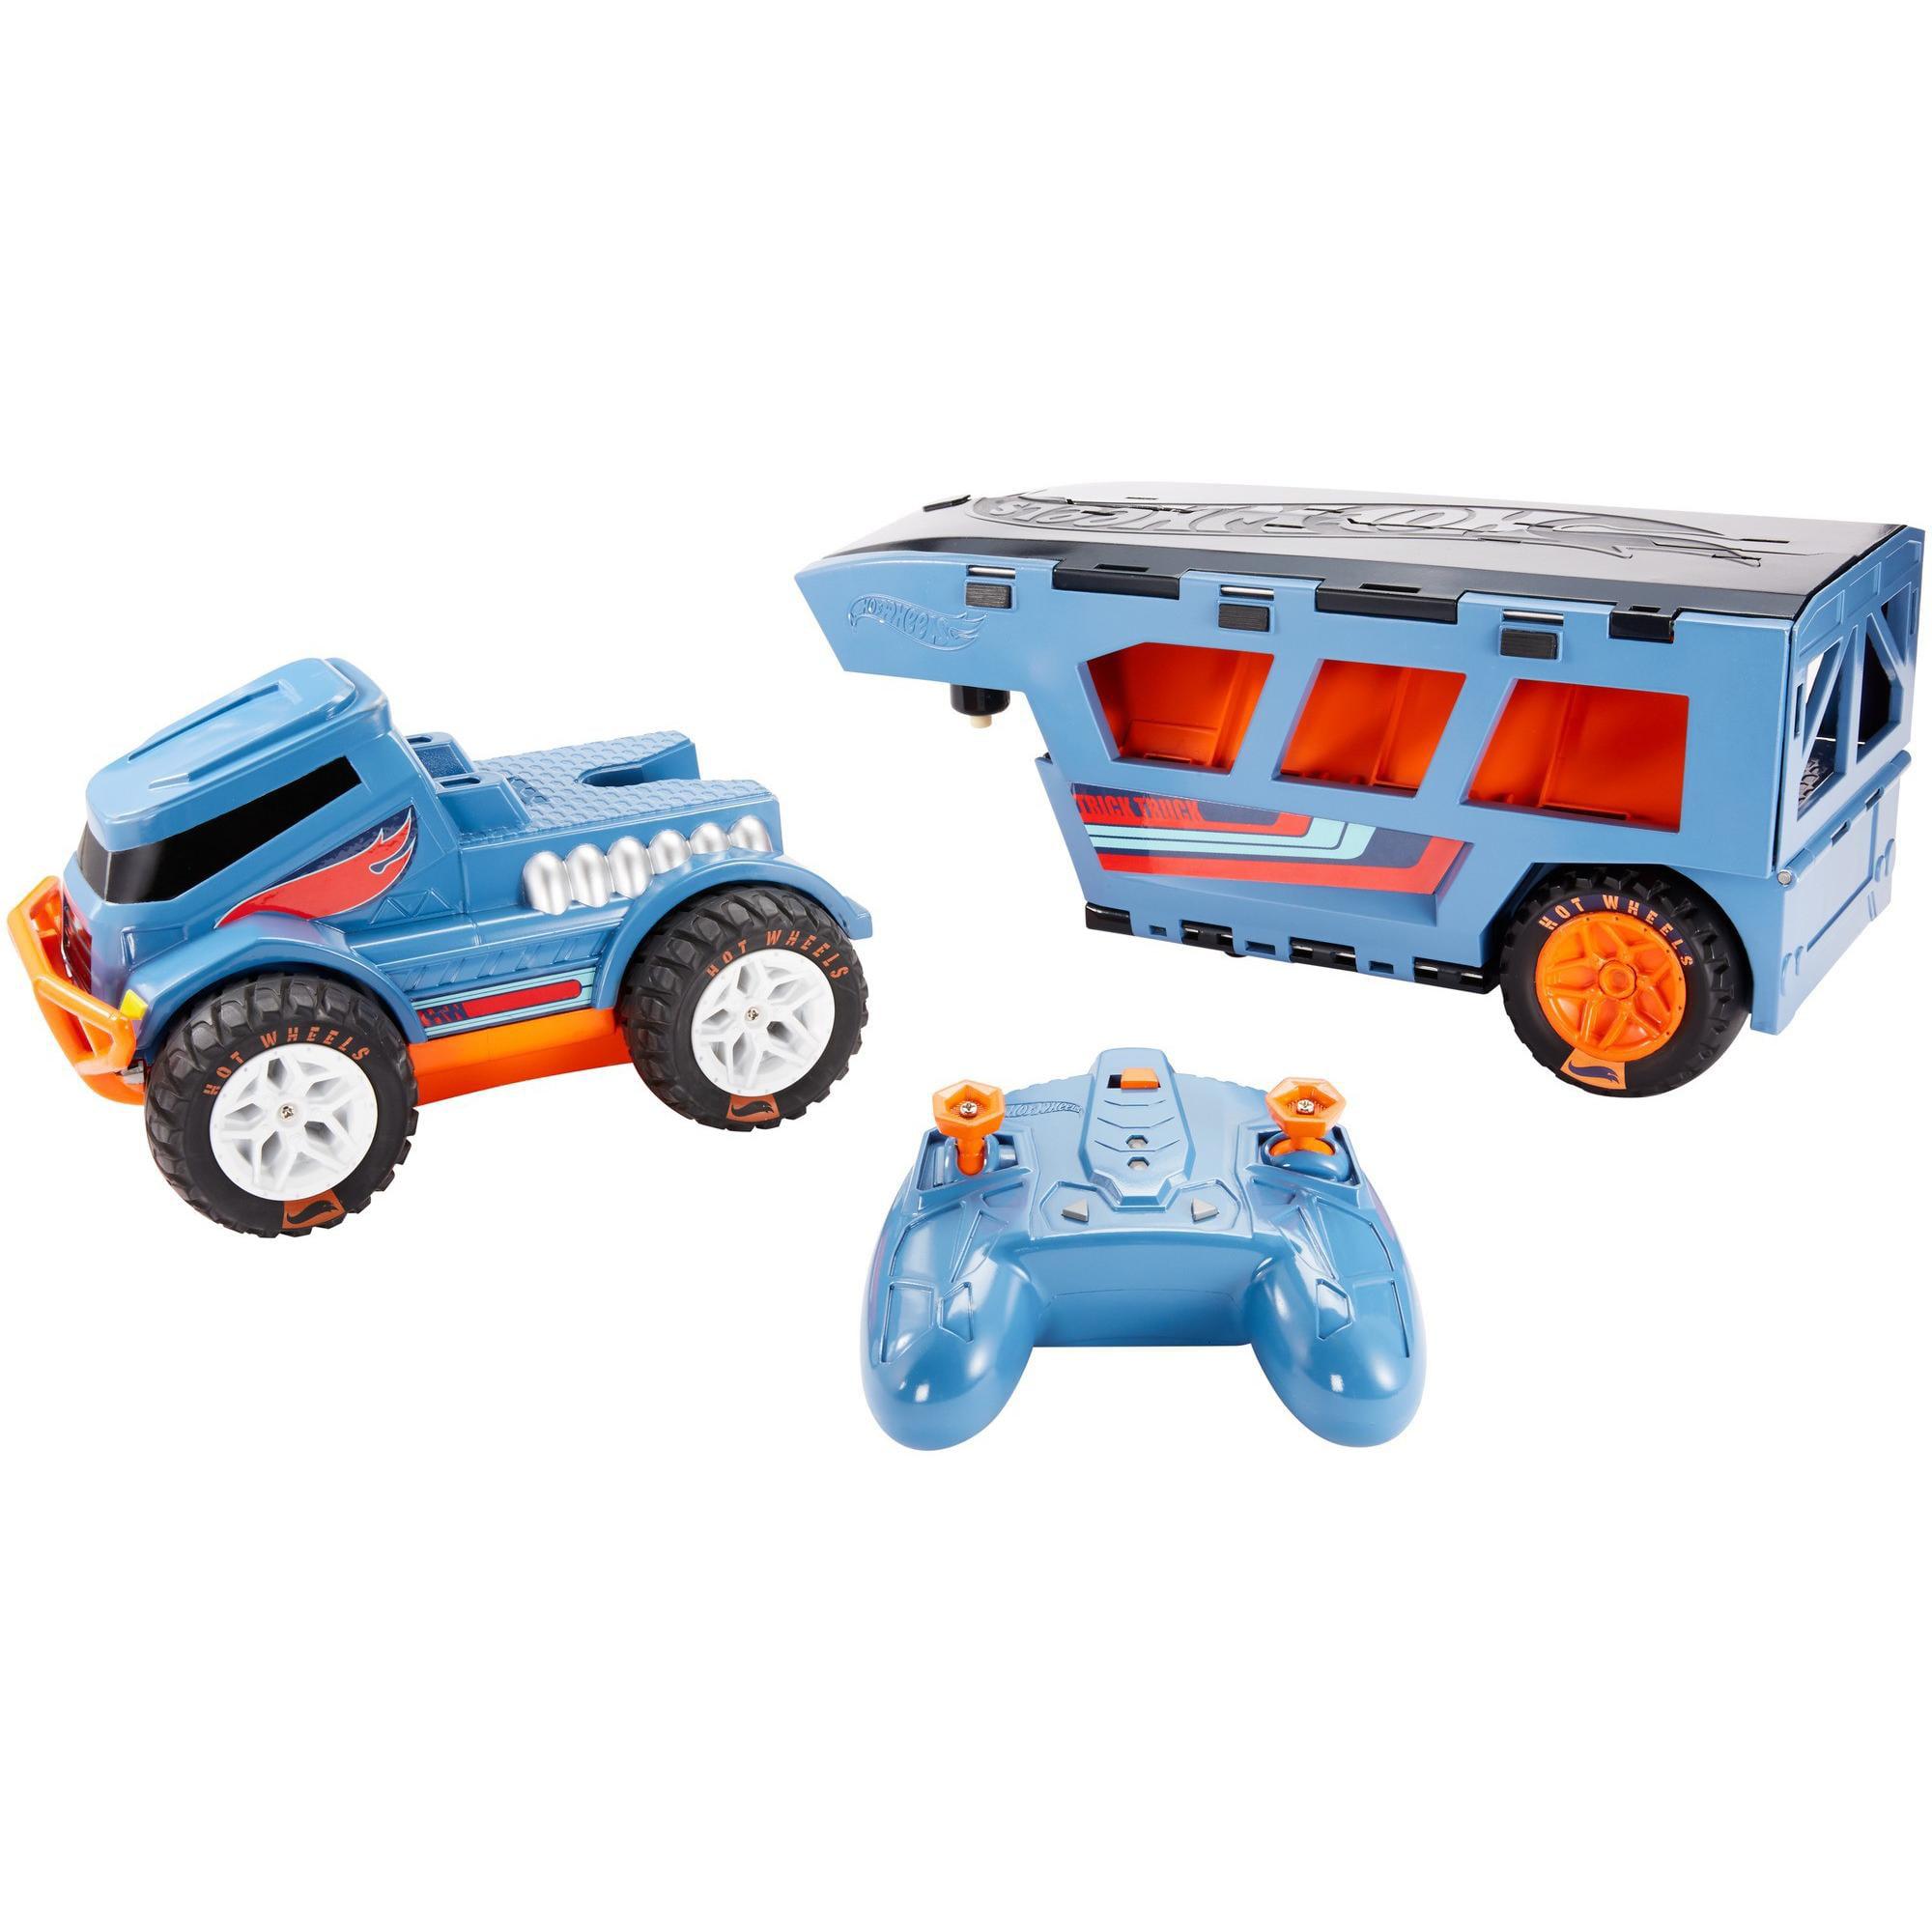 Hot Wheels R C Trick Truck Transforming Stunt Park Vehicle by Mattel